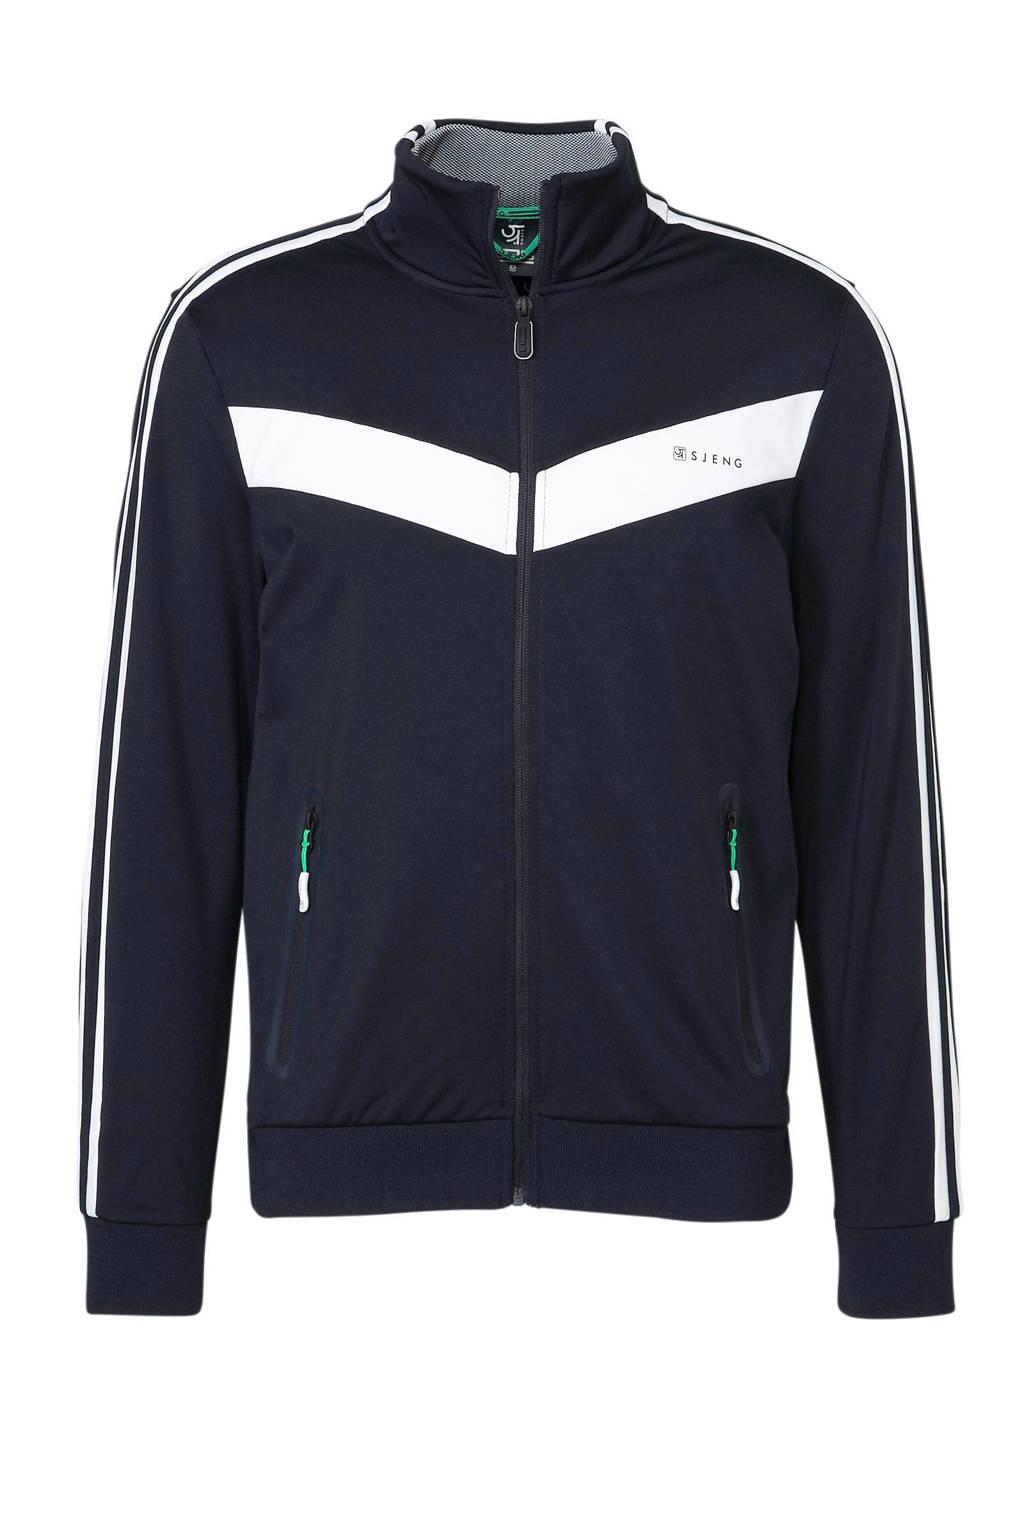 Sjeng Sports   vest donkerblauw, Donkerblauw/wit